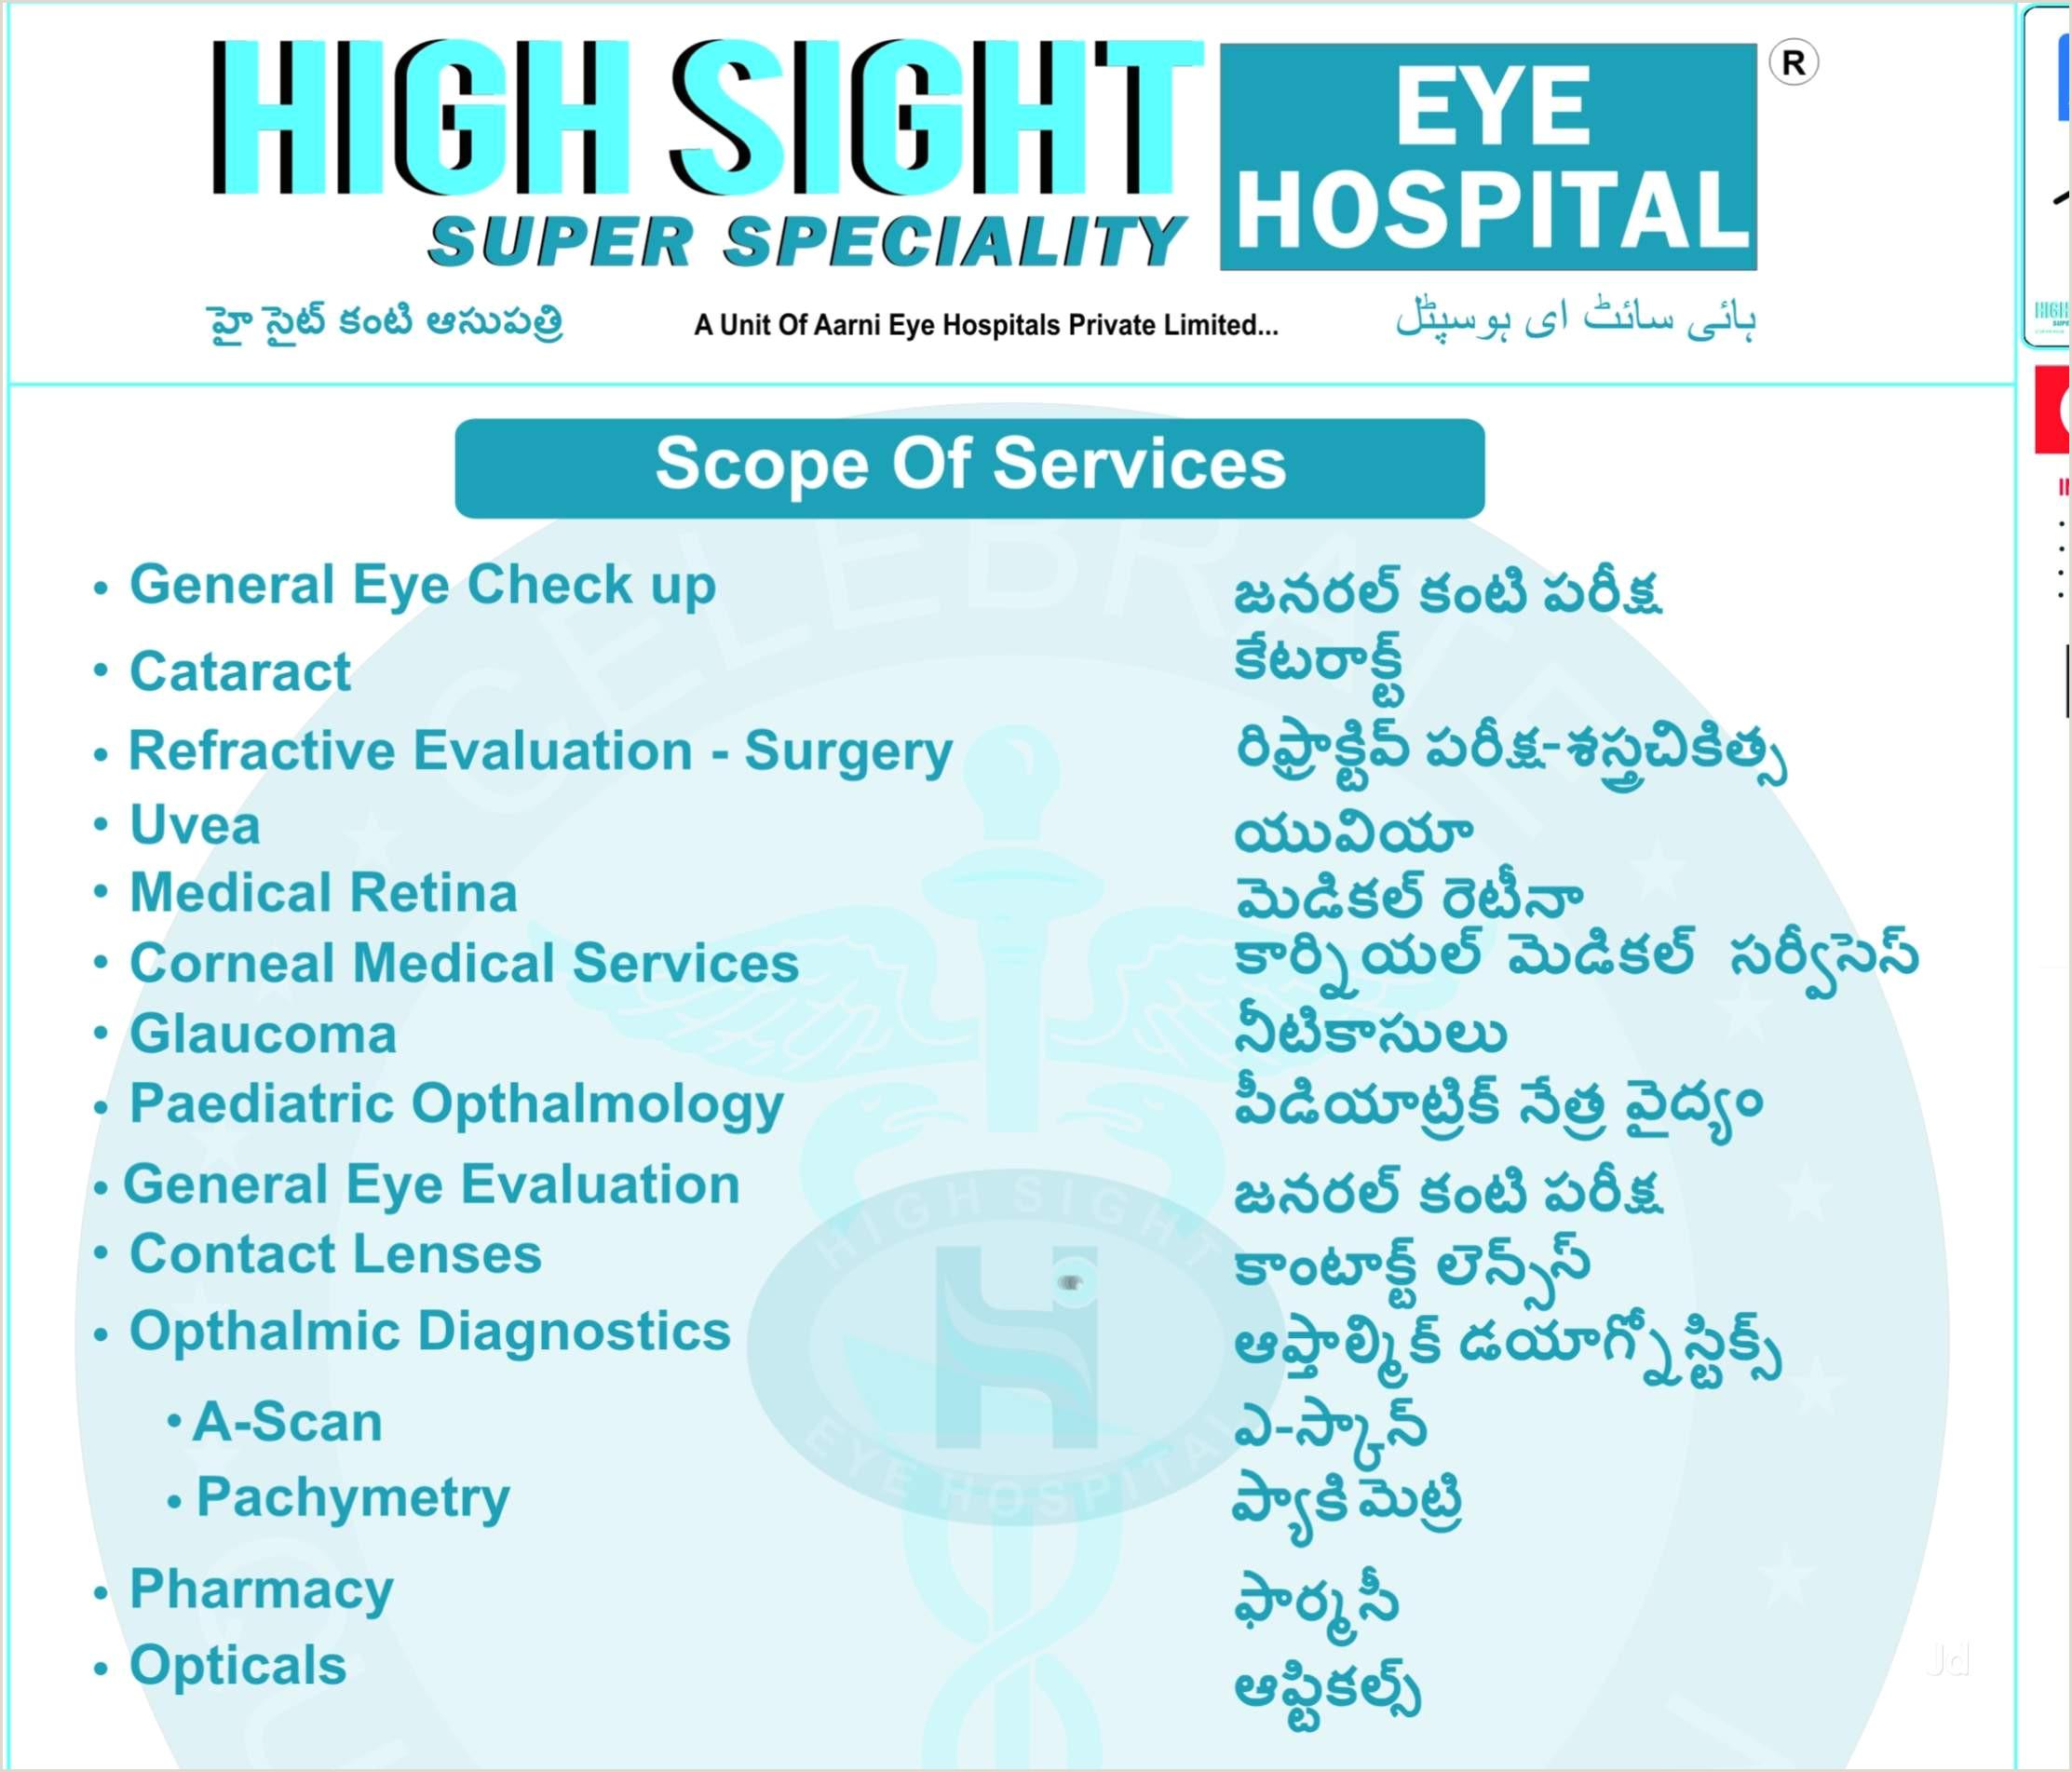 High Scope Lesson Plans High Sight Super Speciality Eye Hospital Eye Hospitals